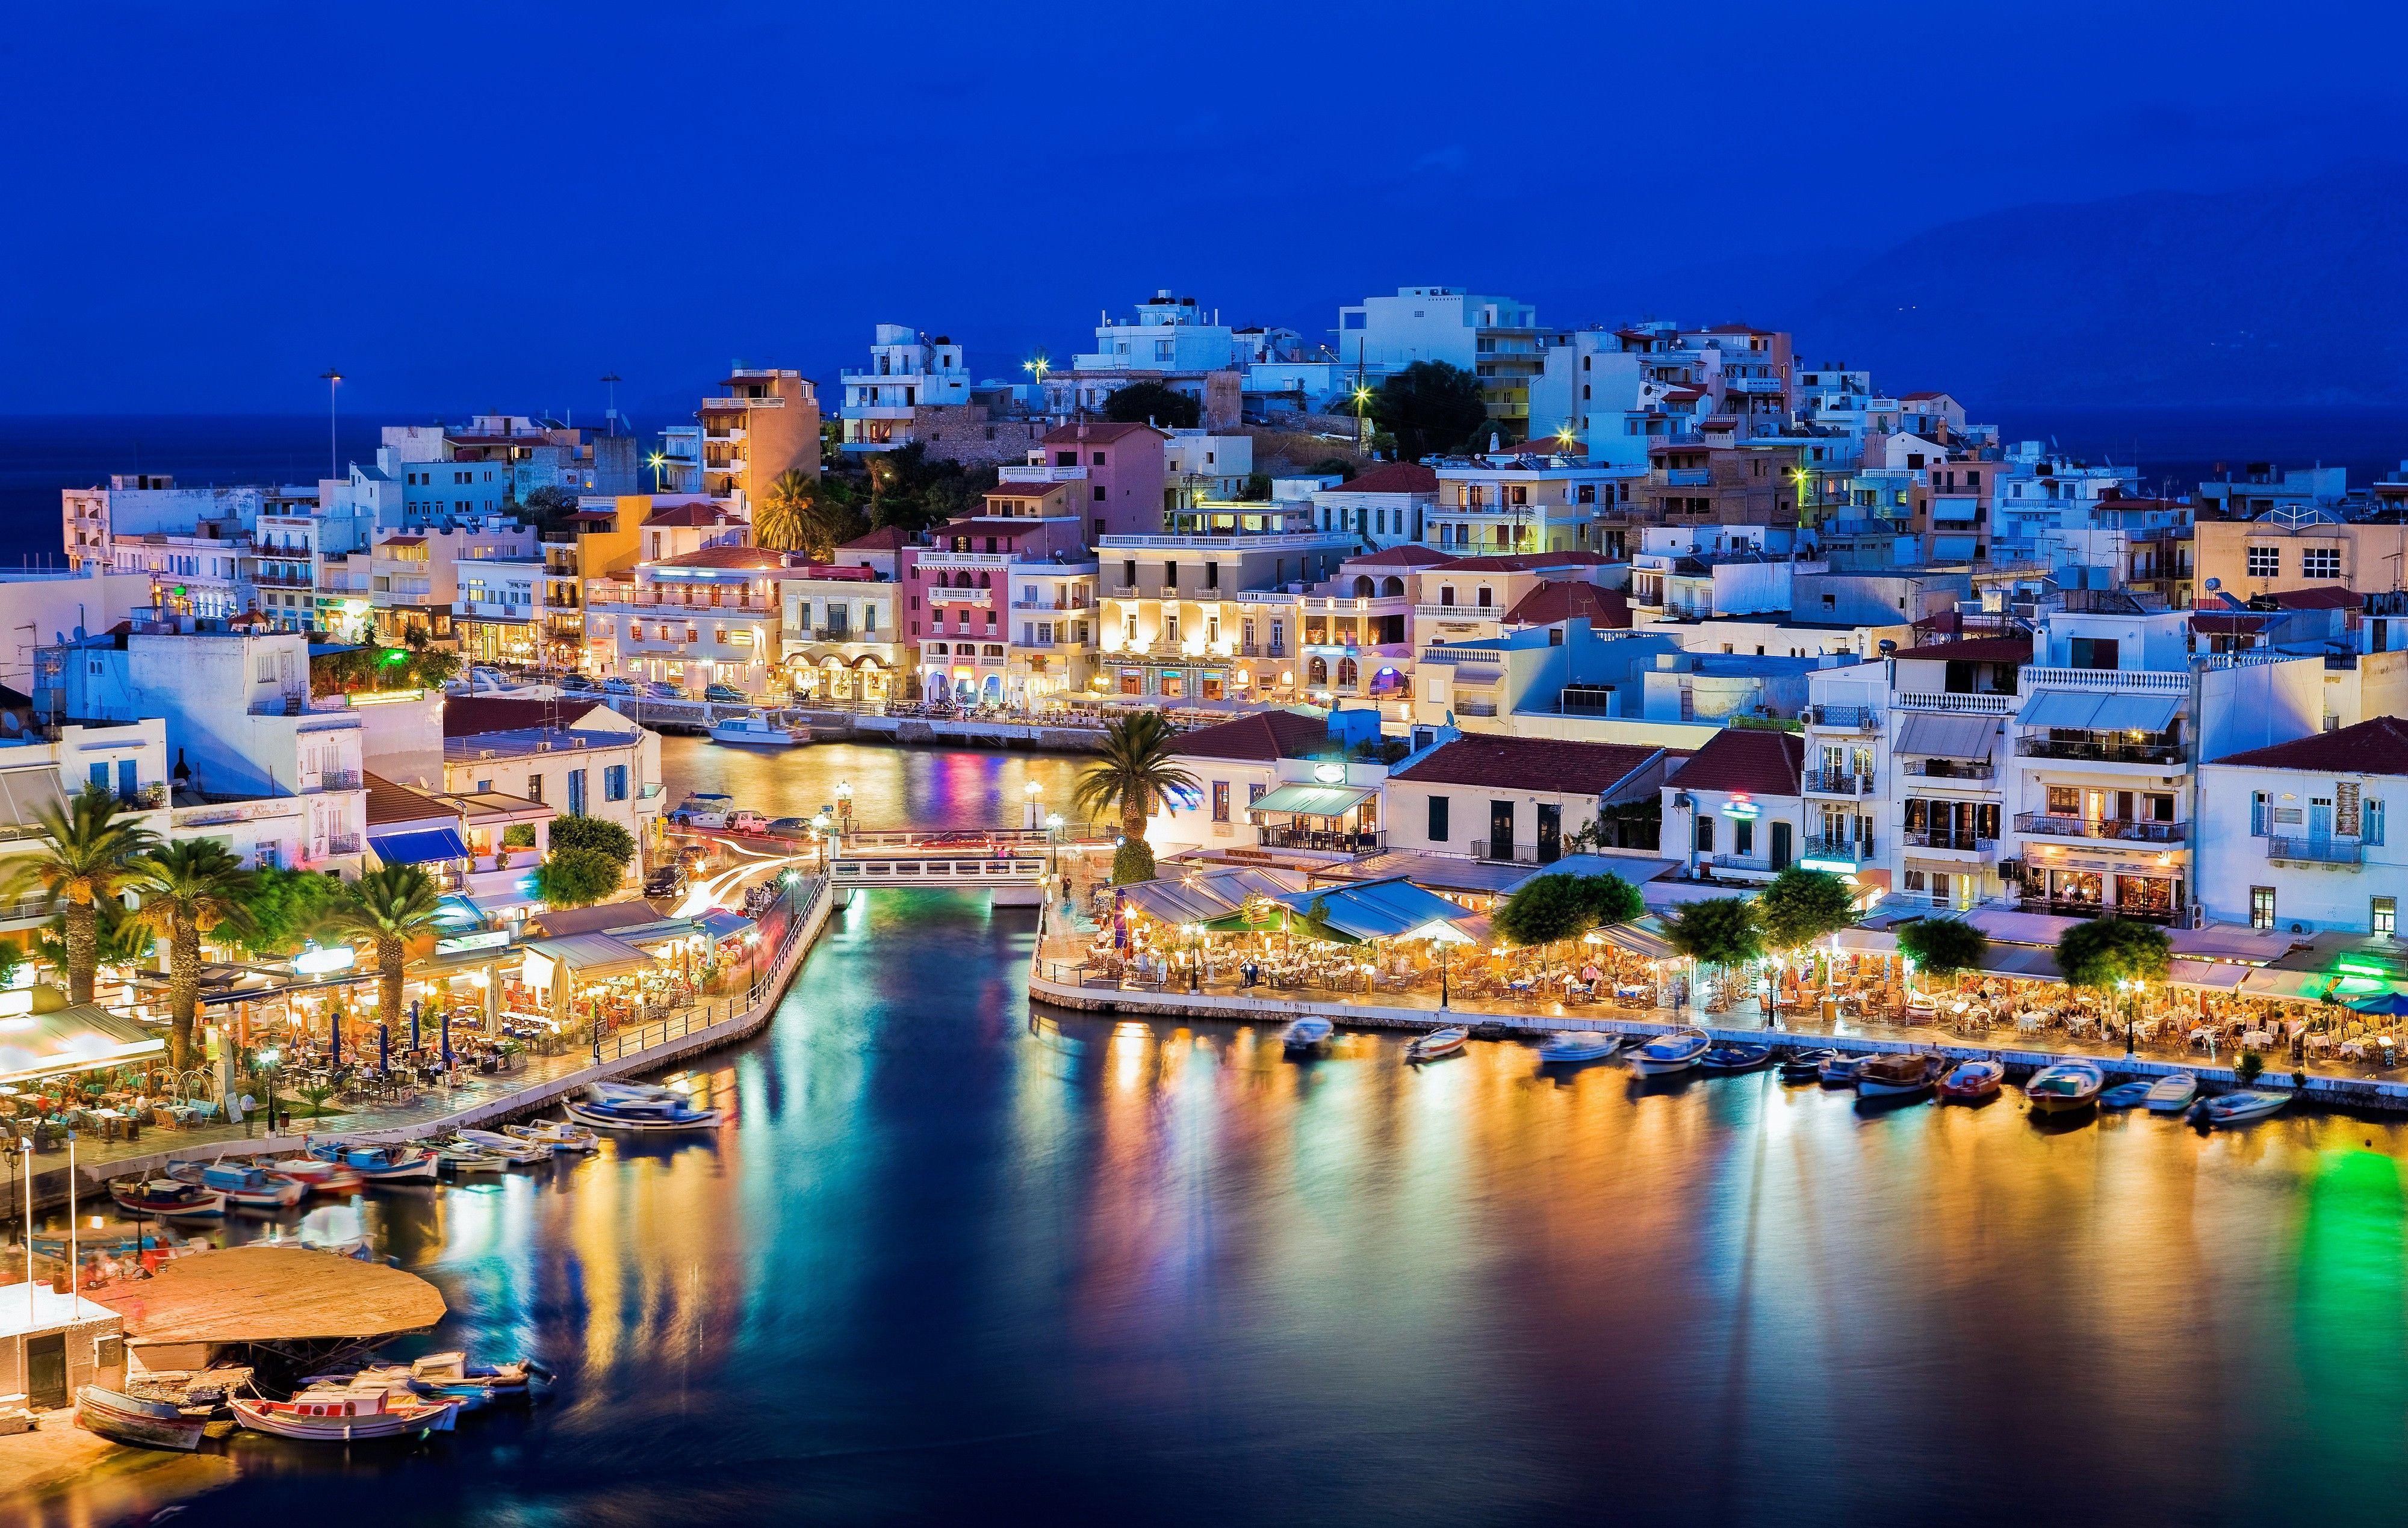 Greece 4K Wallpapers - Top Free Greece 4K Backgrounds ...